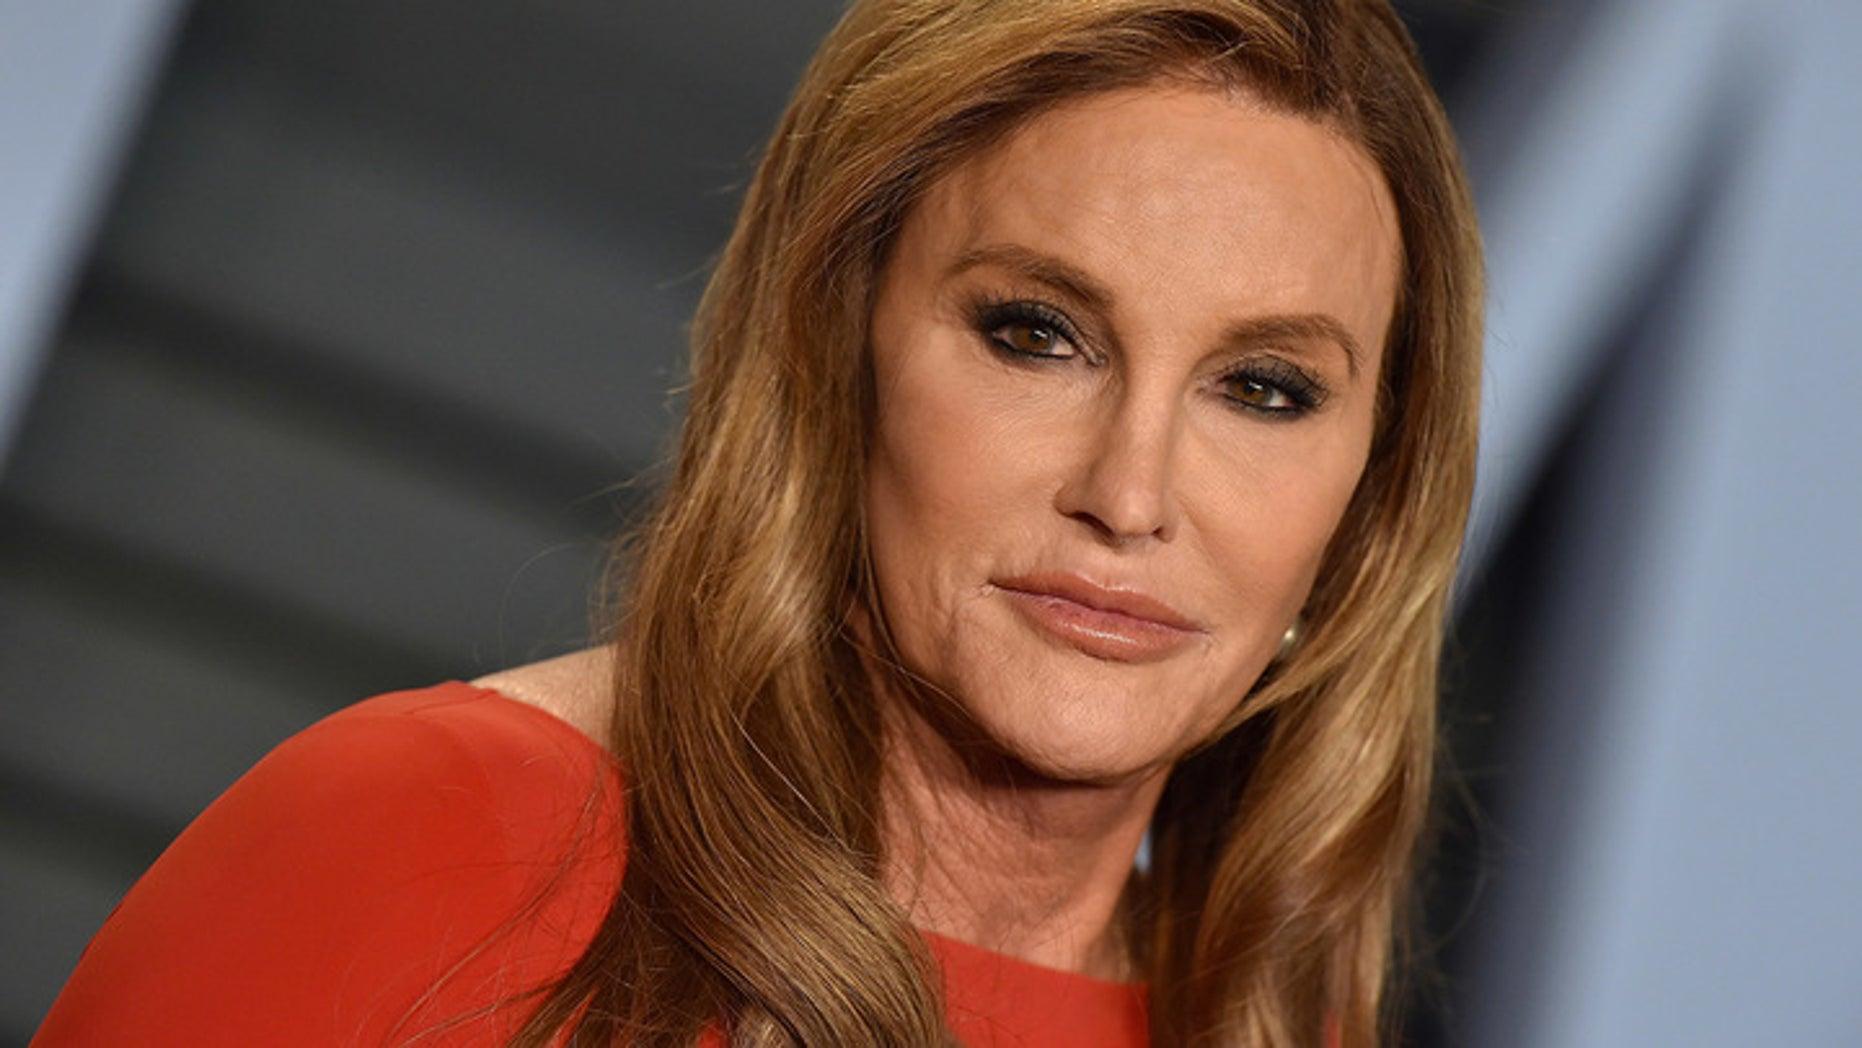 FILE: Caitlyn Jenner attending the 2018 Vanity Fair Oscar Party.